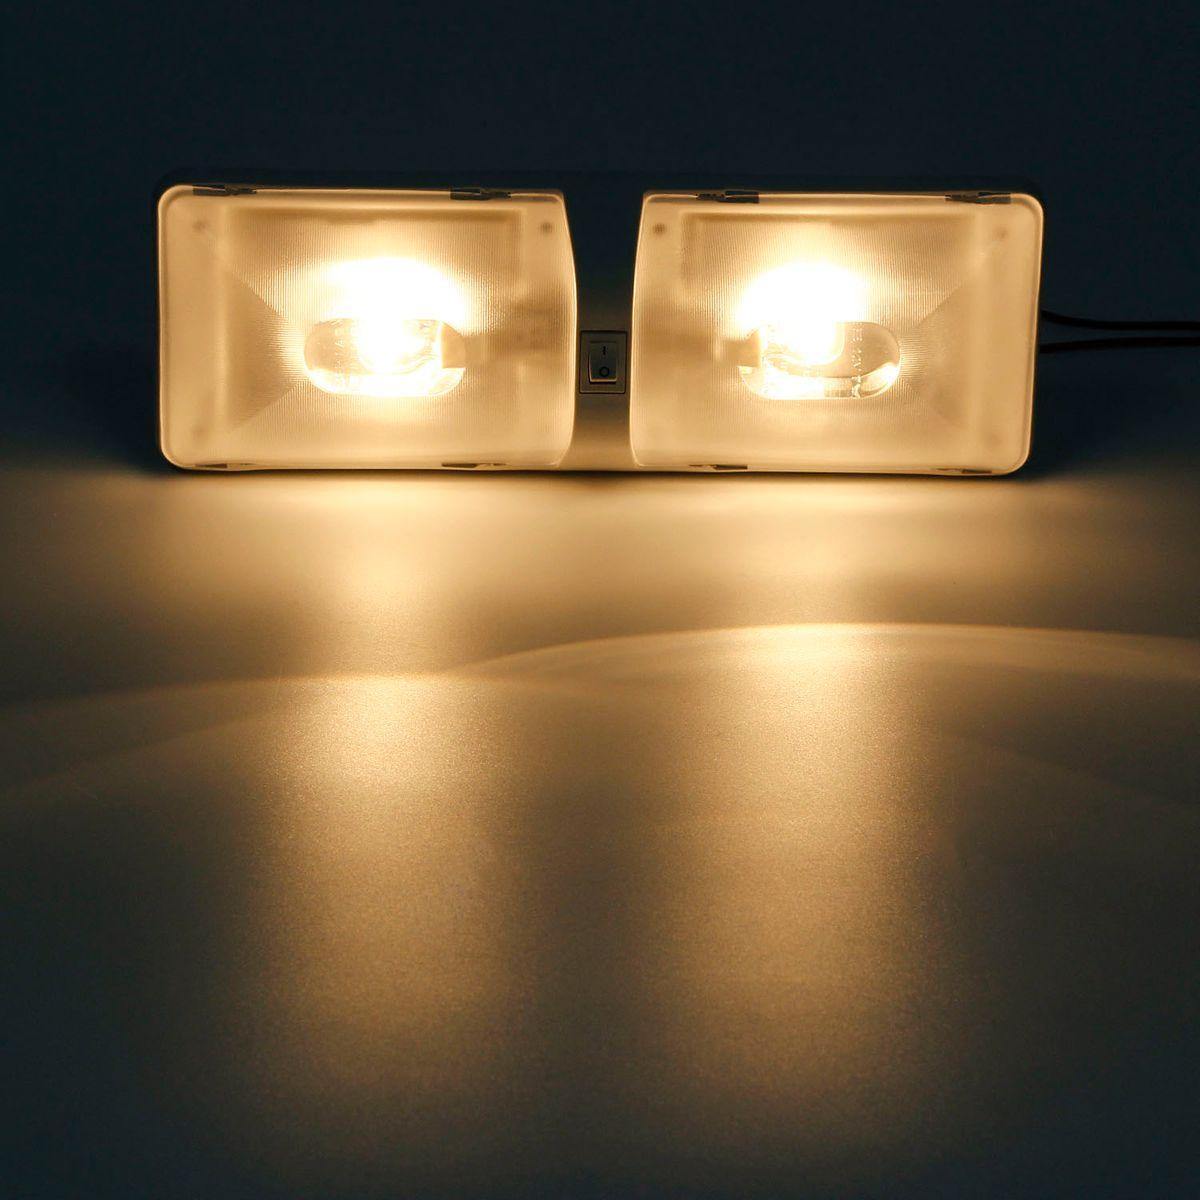 Double Dome Cargo Light Fixtures 12v Ceiling Interior Camper Rv Trailer Lamp Ebay